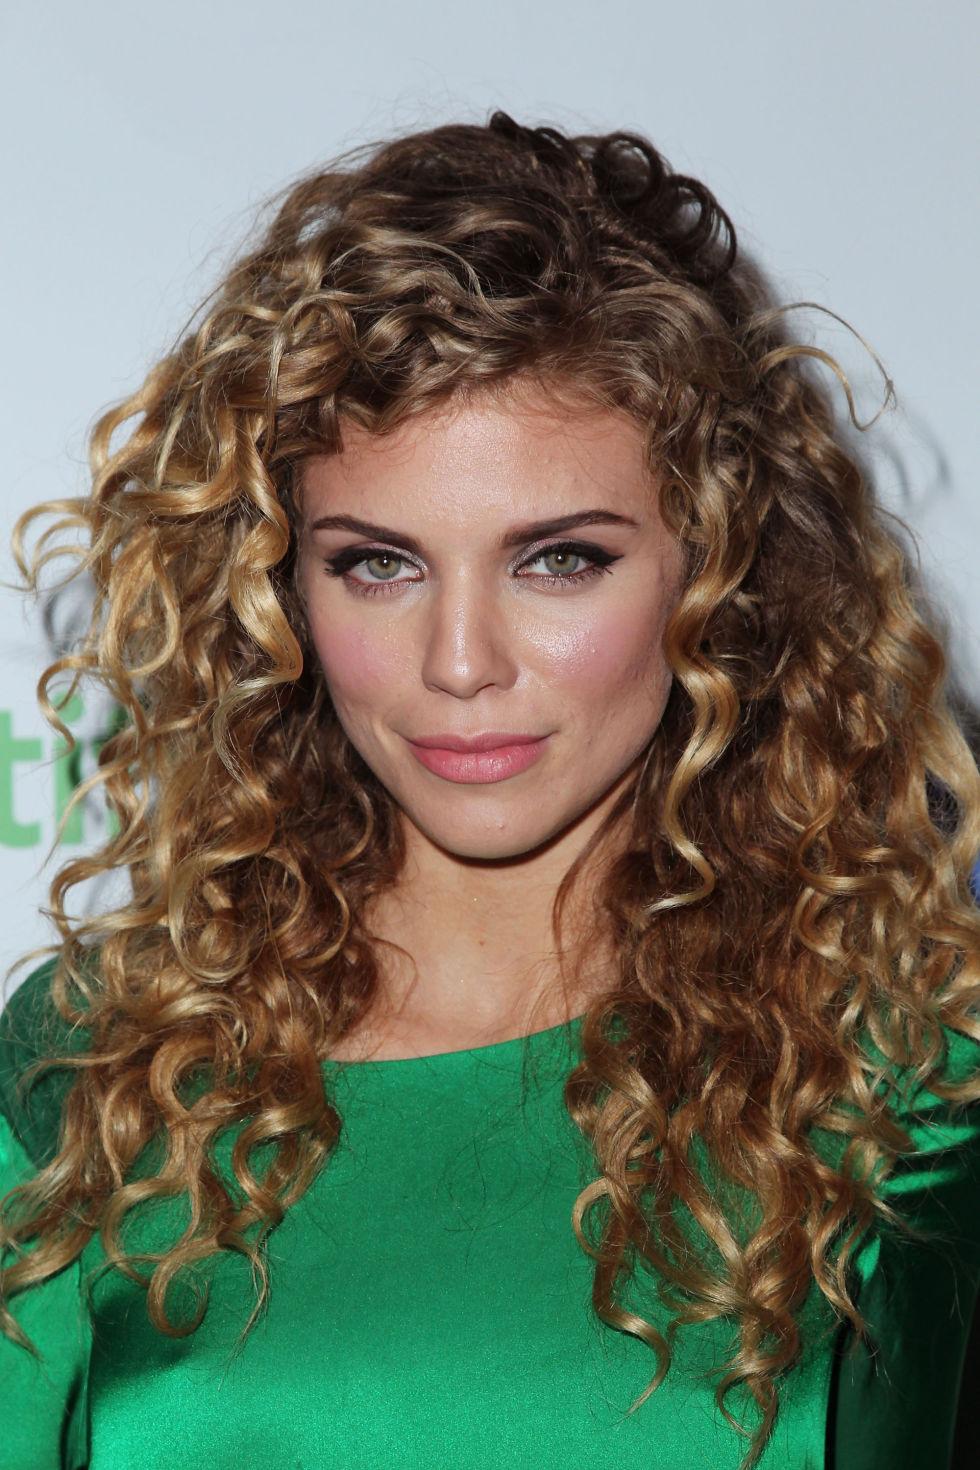 Sensational 30 Best Curly Hairstyles Of 2017 Cute Hairstyles For Curly Hair Hairstyles For Men Maxibearus